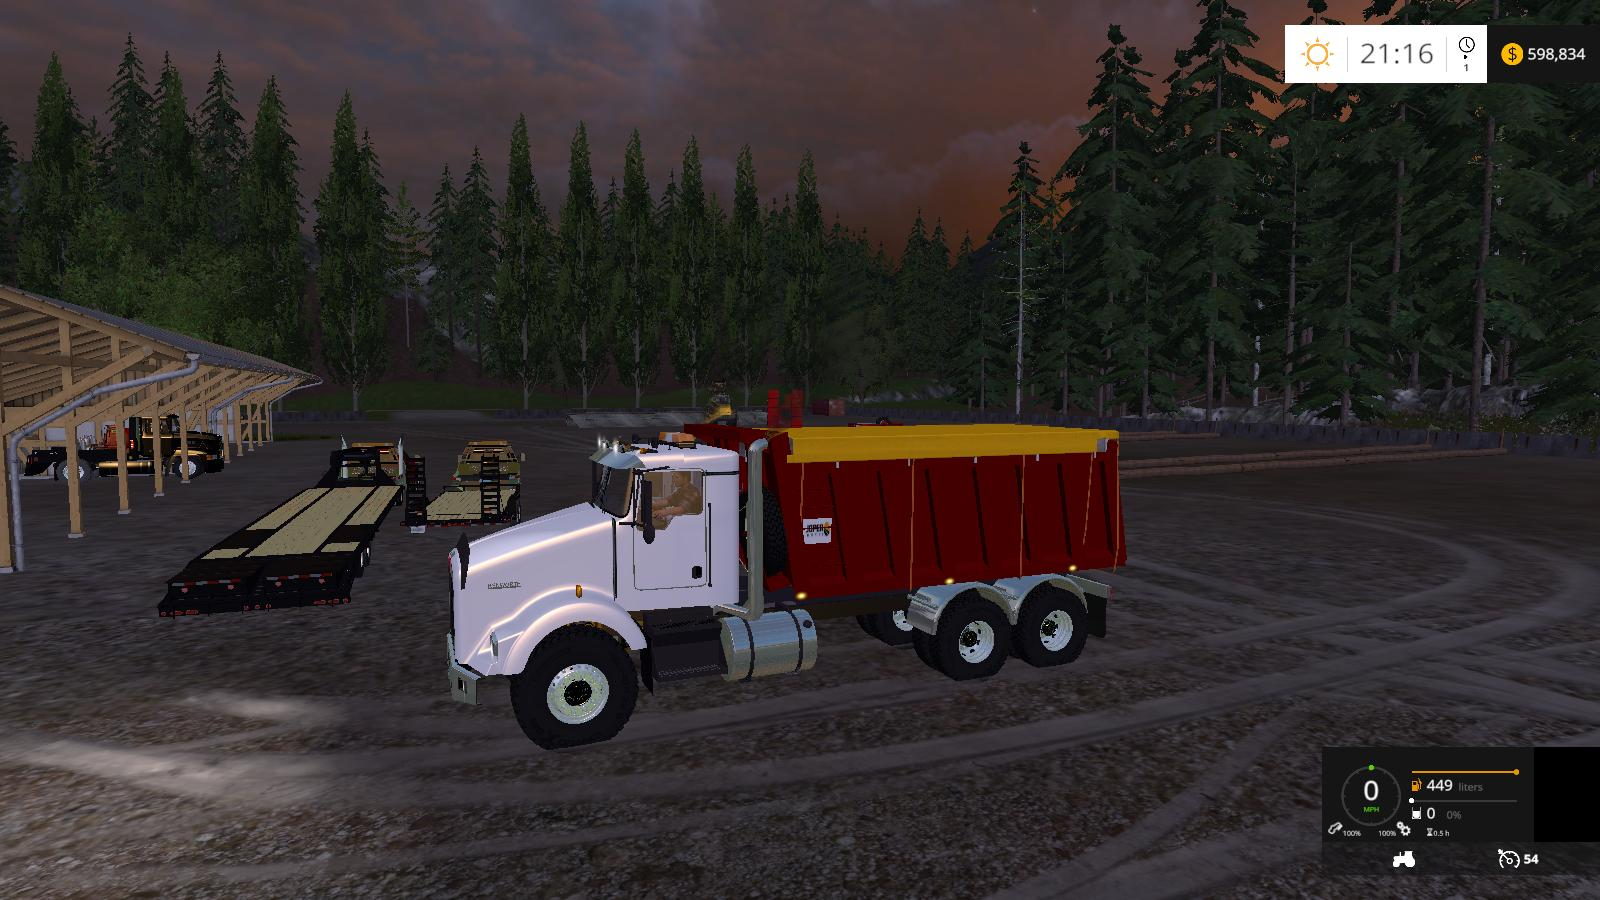 KENWORTH DUMP BED TRUCK V2 - Farming simulator 2019 / 2017 ...Kenworth Dump Trucks Fs19